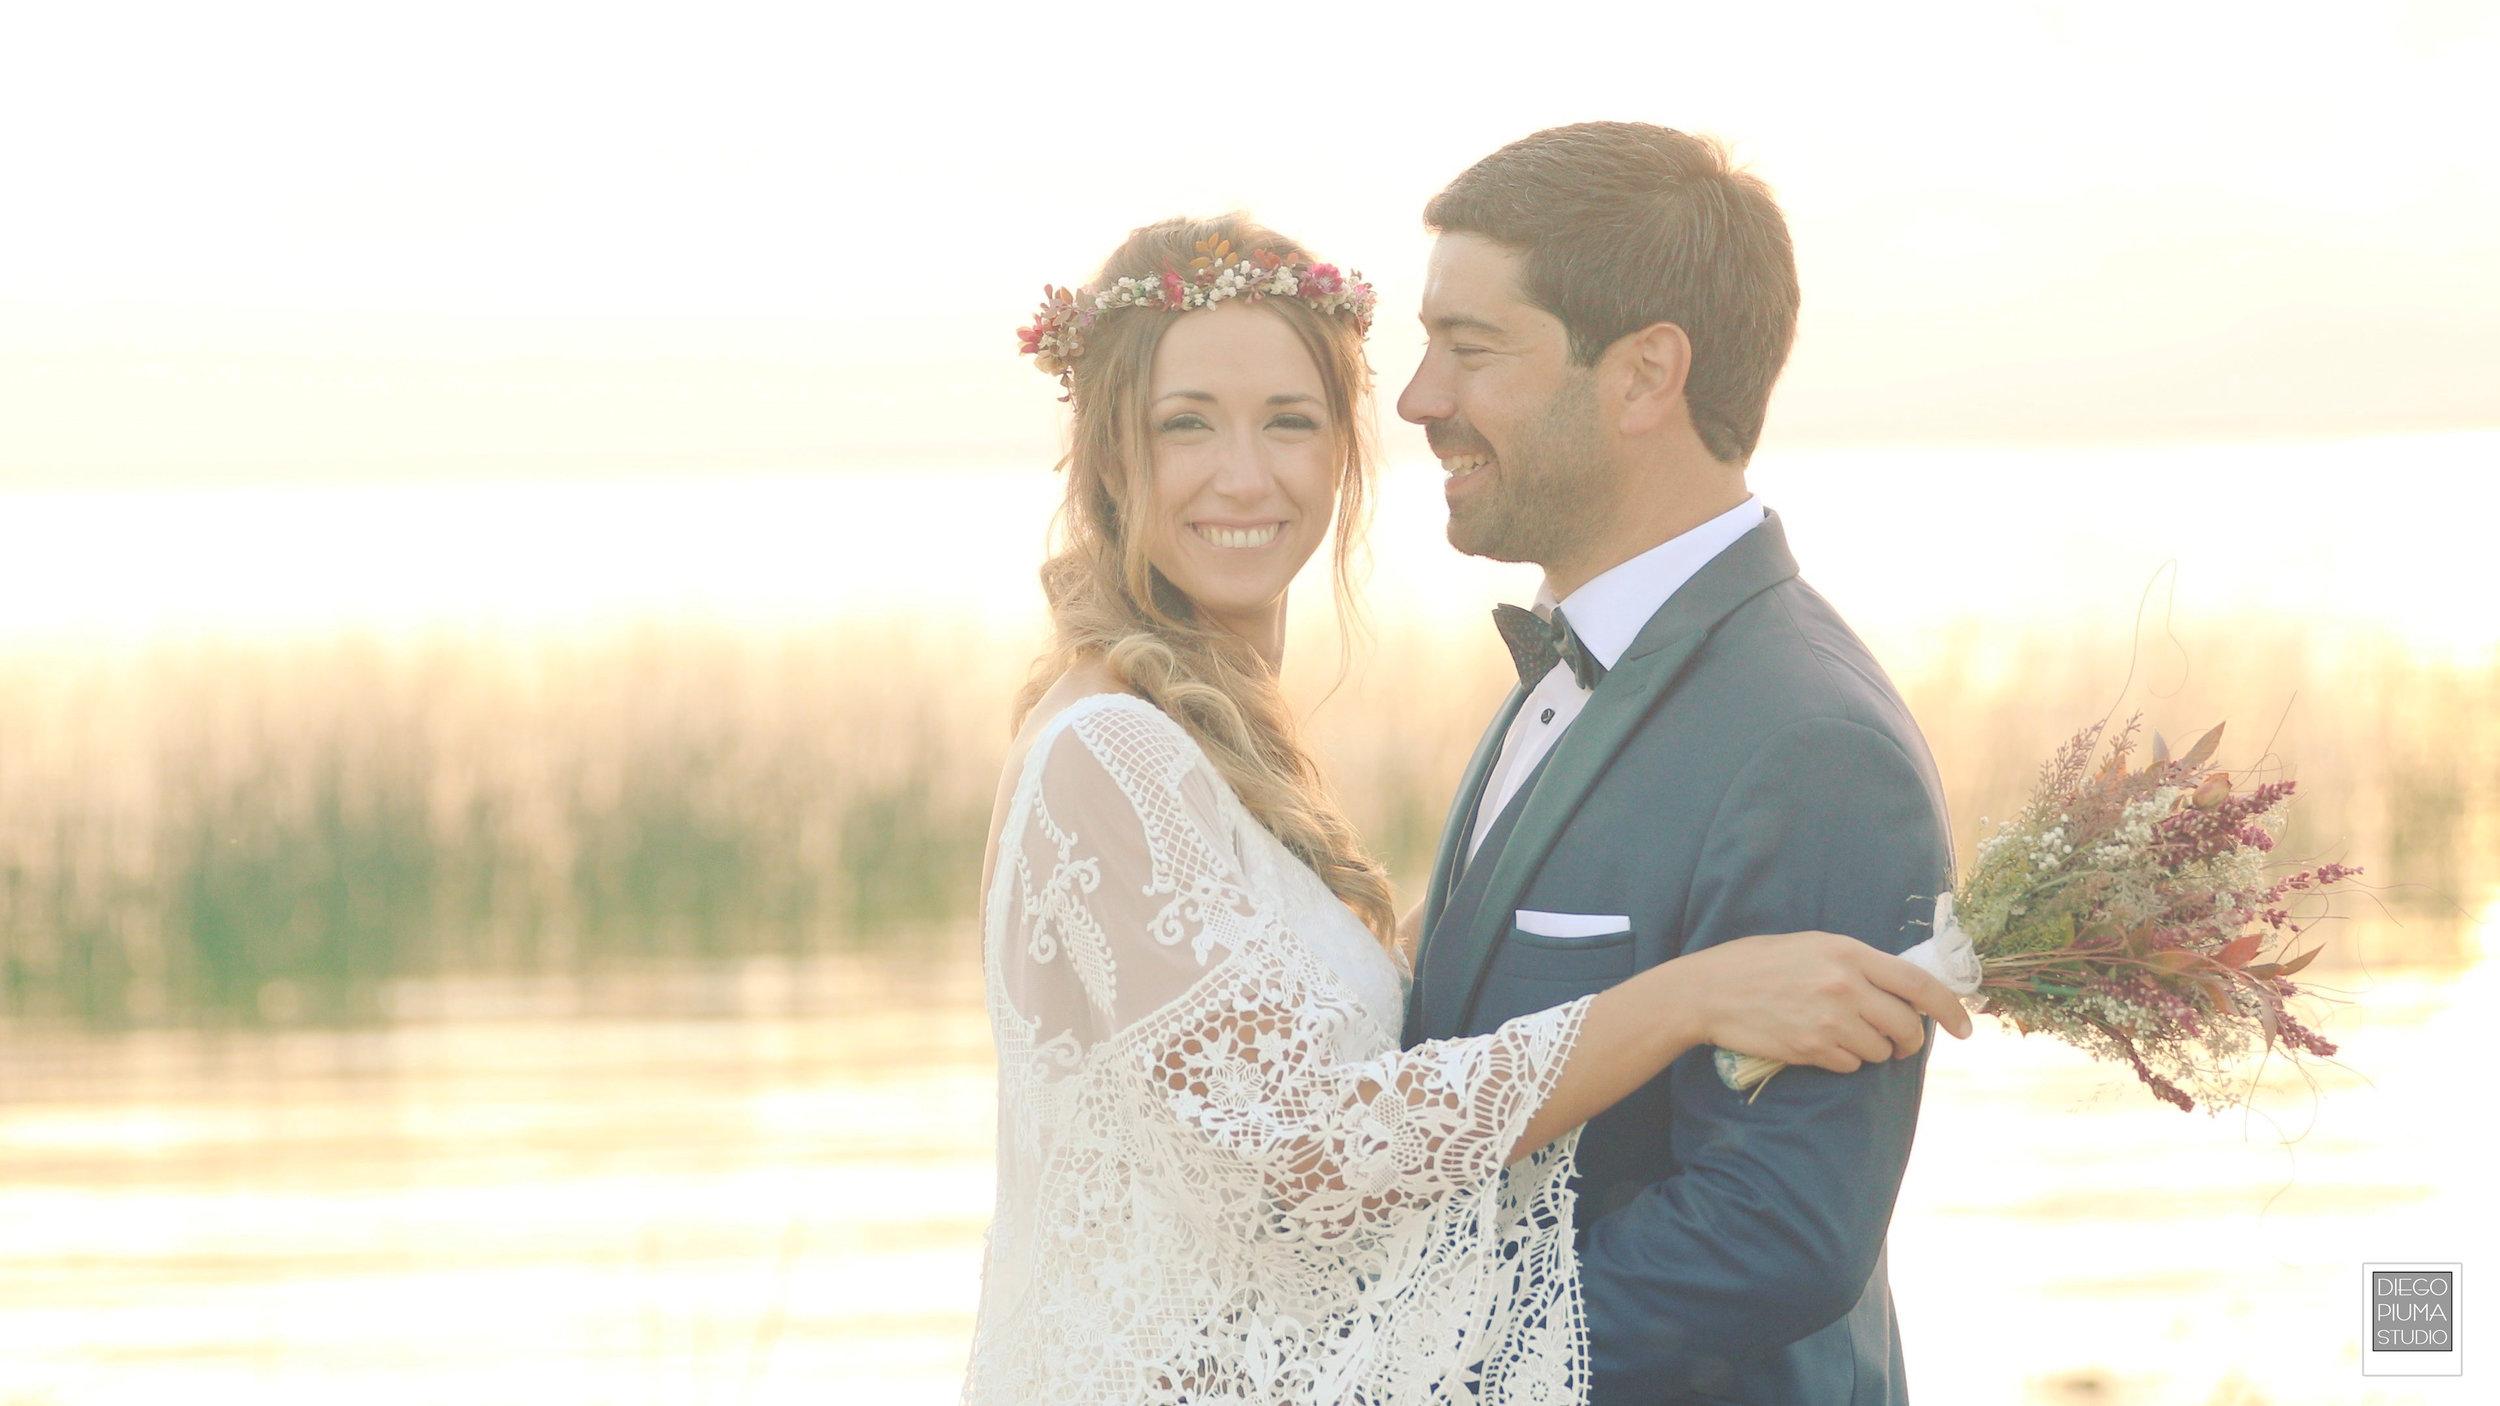 04-Fotografía-Bodas-Casamiento-Eventos-Fiesta-Diego-Piuma.jpg